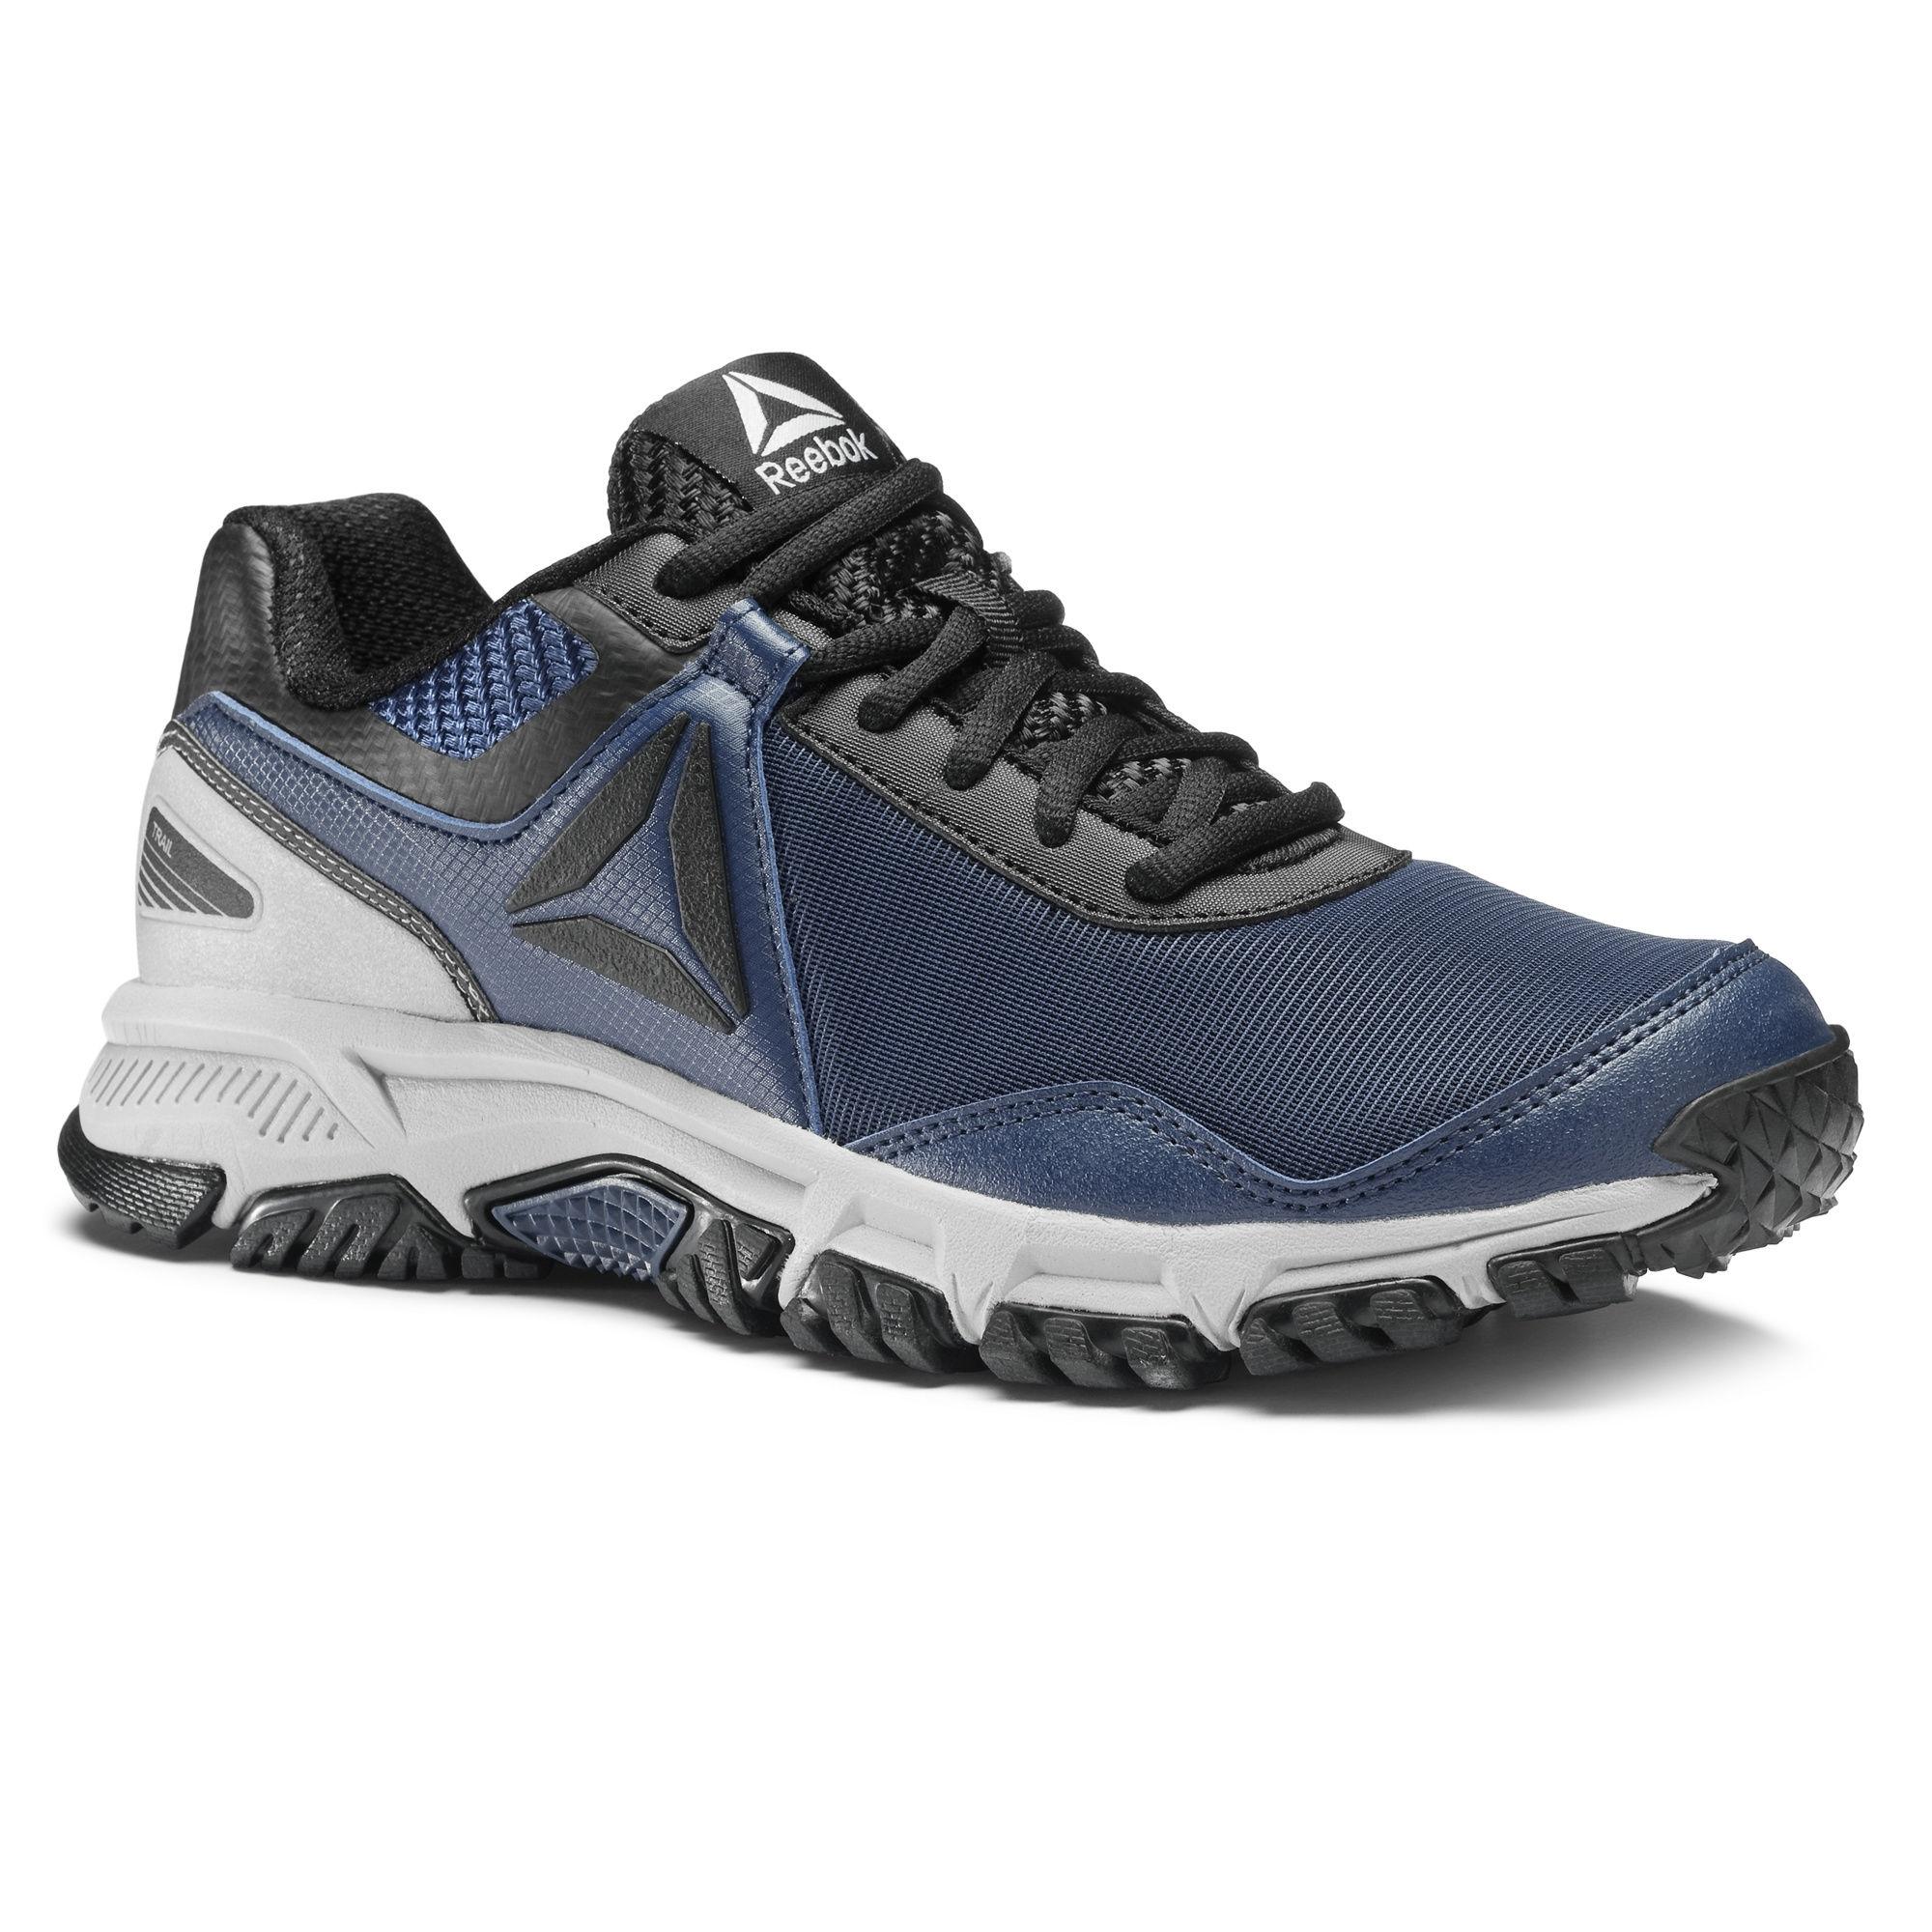 78ef9ba0af7c1 Chaussures Reebok Ridgerider Trail 3.0